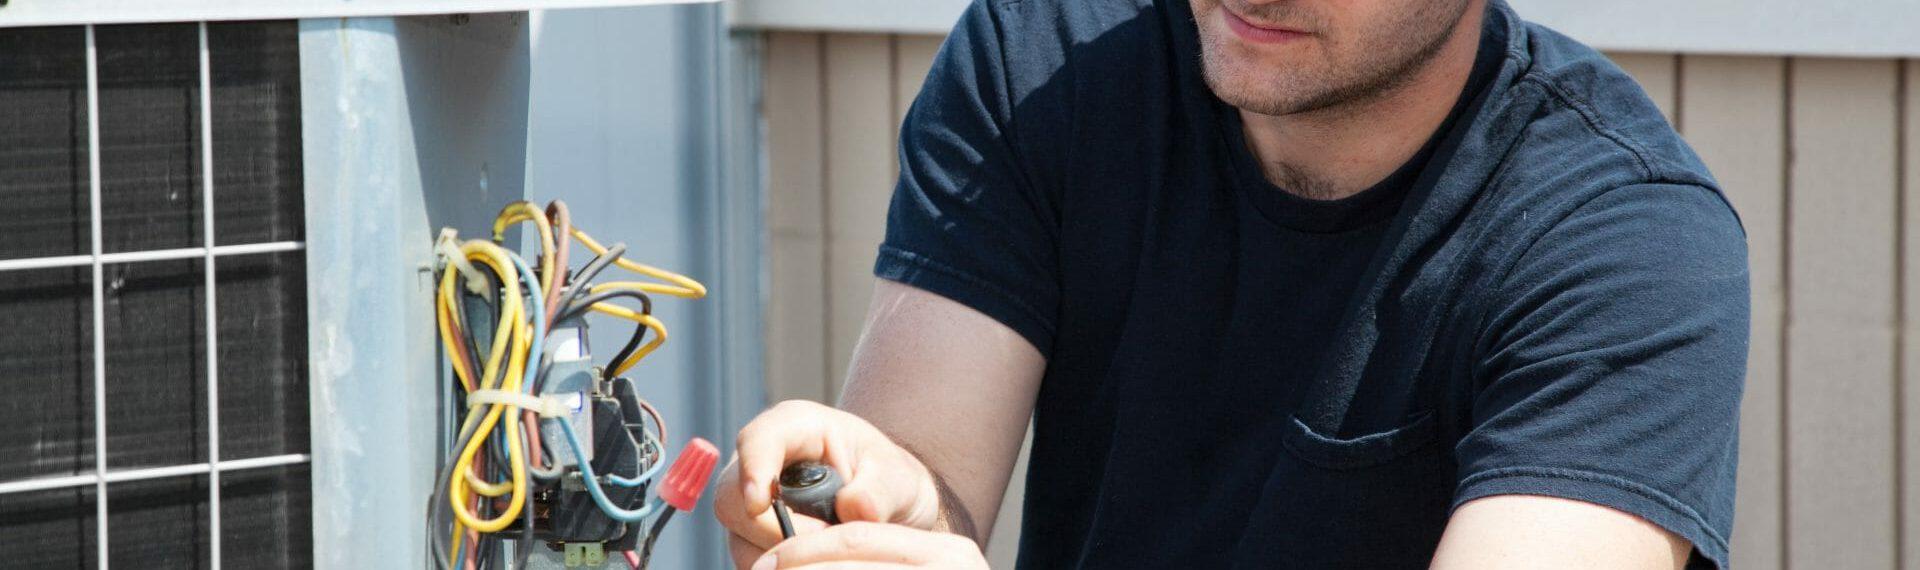 Tips For Keeping Safe As A Tradesman